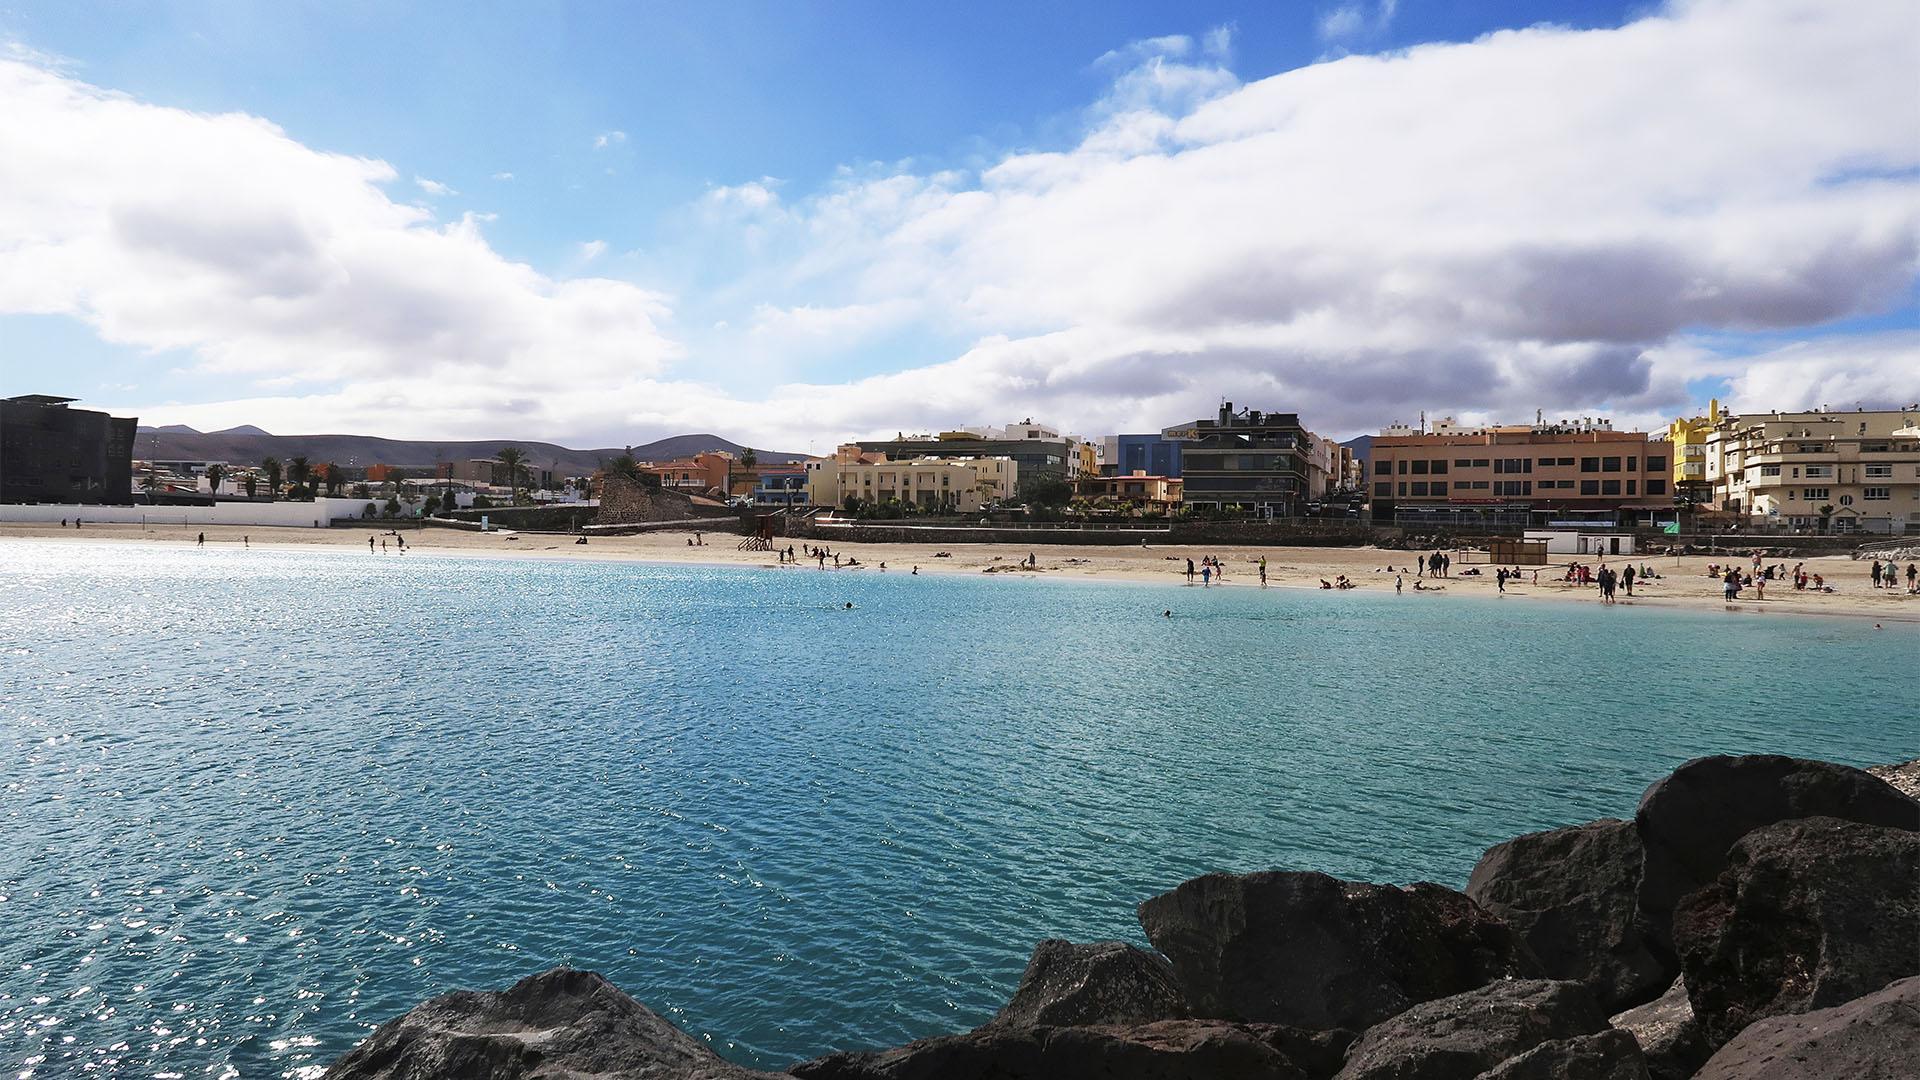 Puerto del Rosario Fuerteventura – der Stadtstrand Playa de los Pozos oder auch Playa Chica genannt.